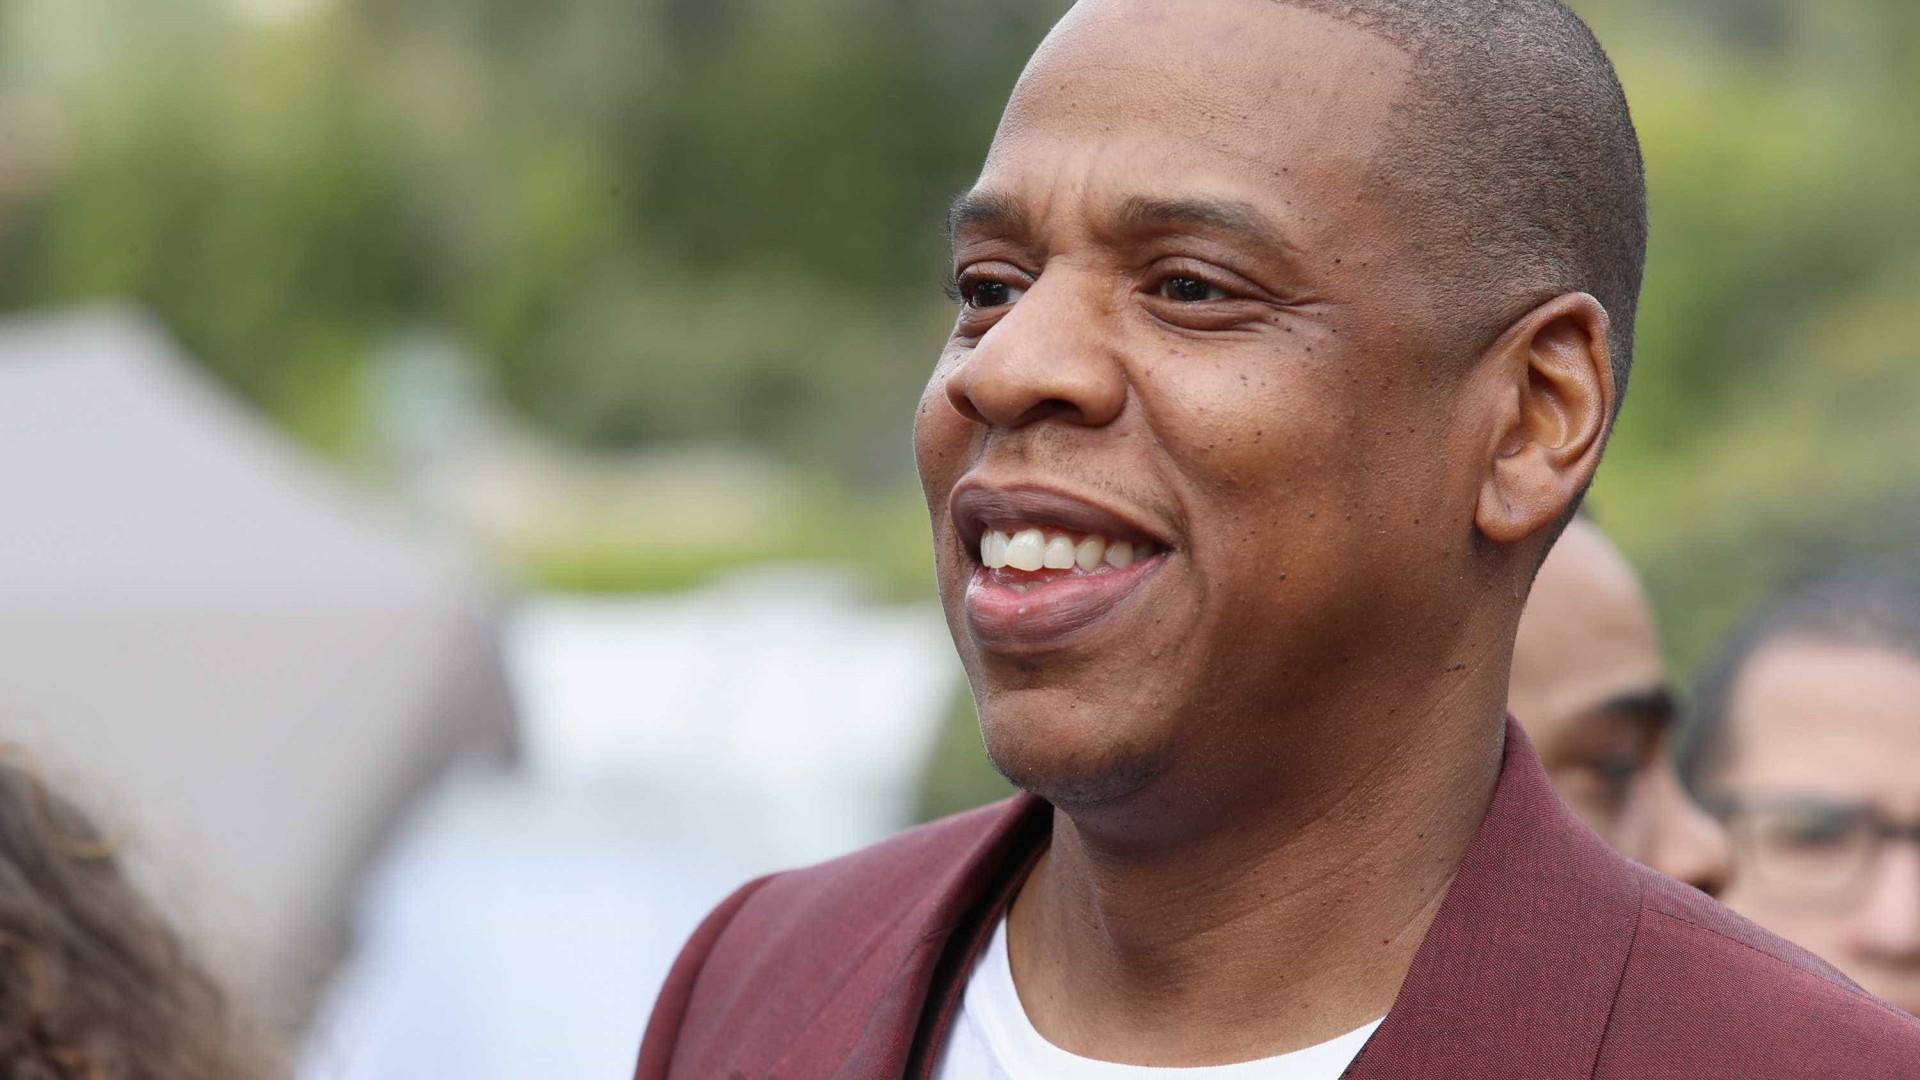 Jay-Z se mostra arrependido por ter traído Beyonce em novo hit